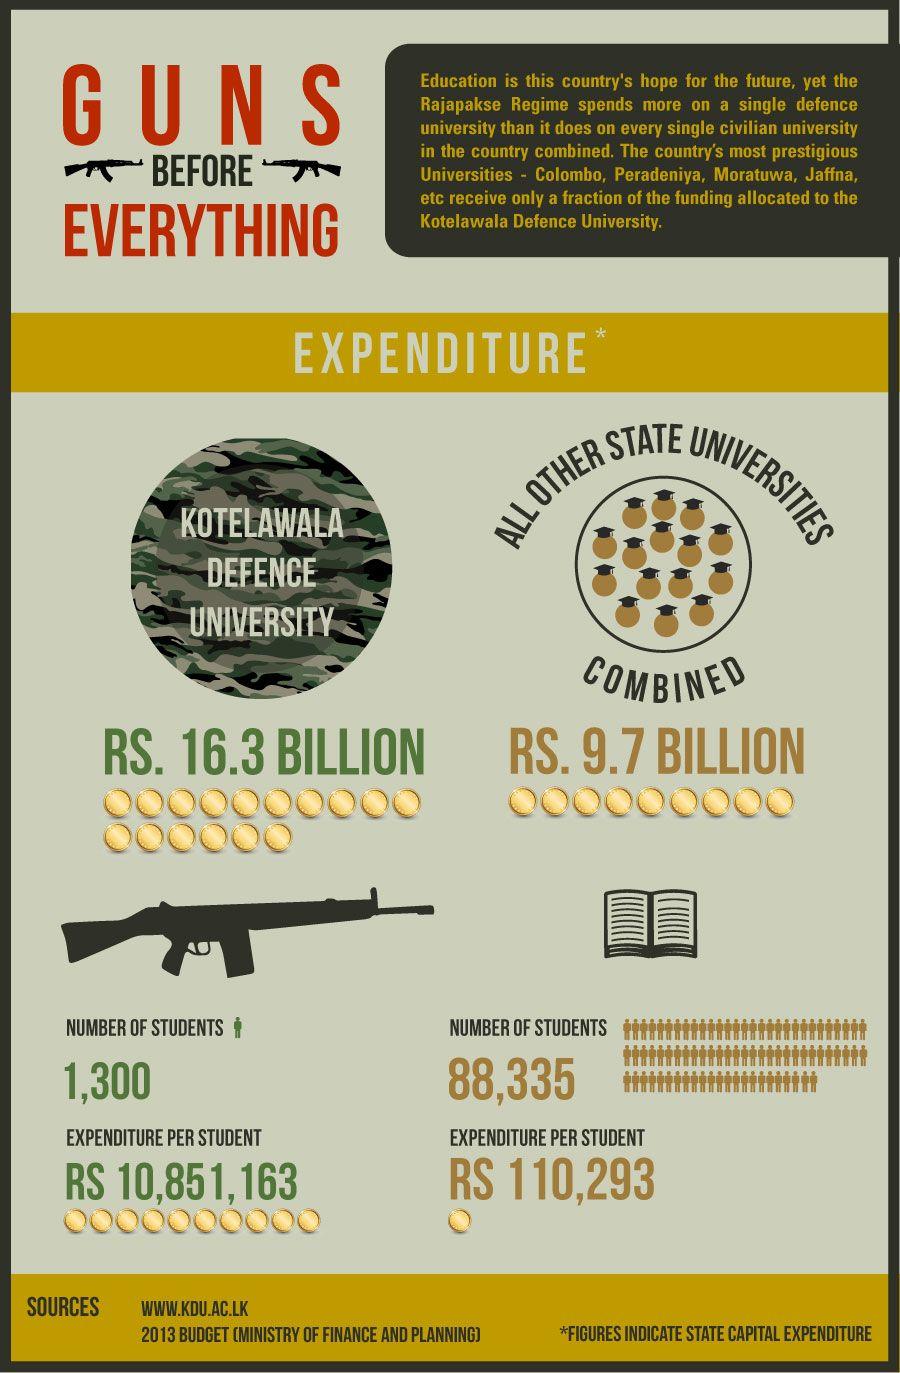 Infographic-Guns01-6-1